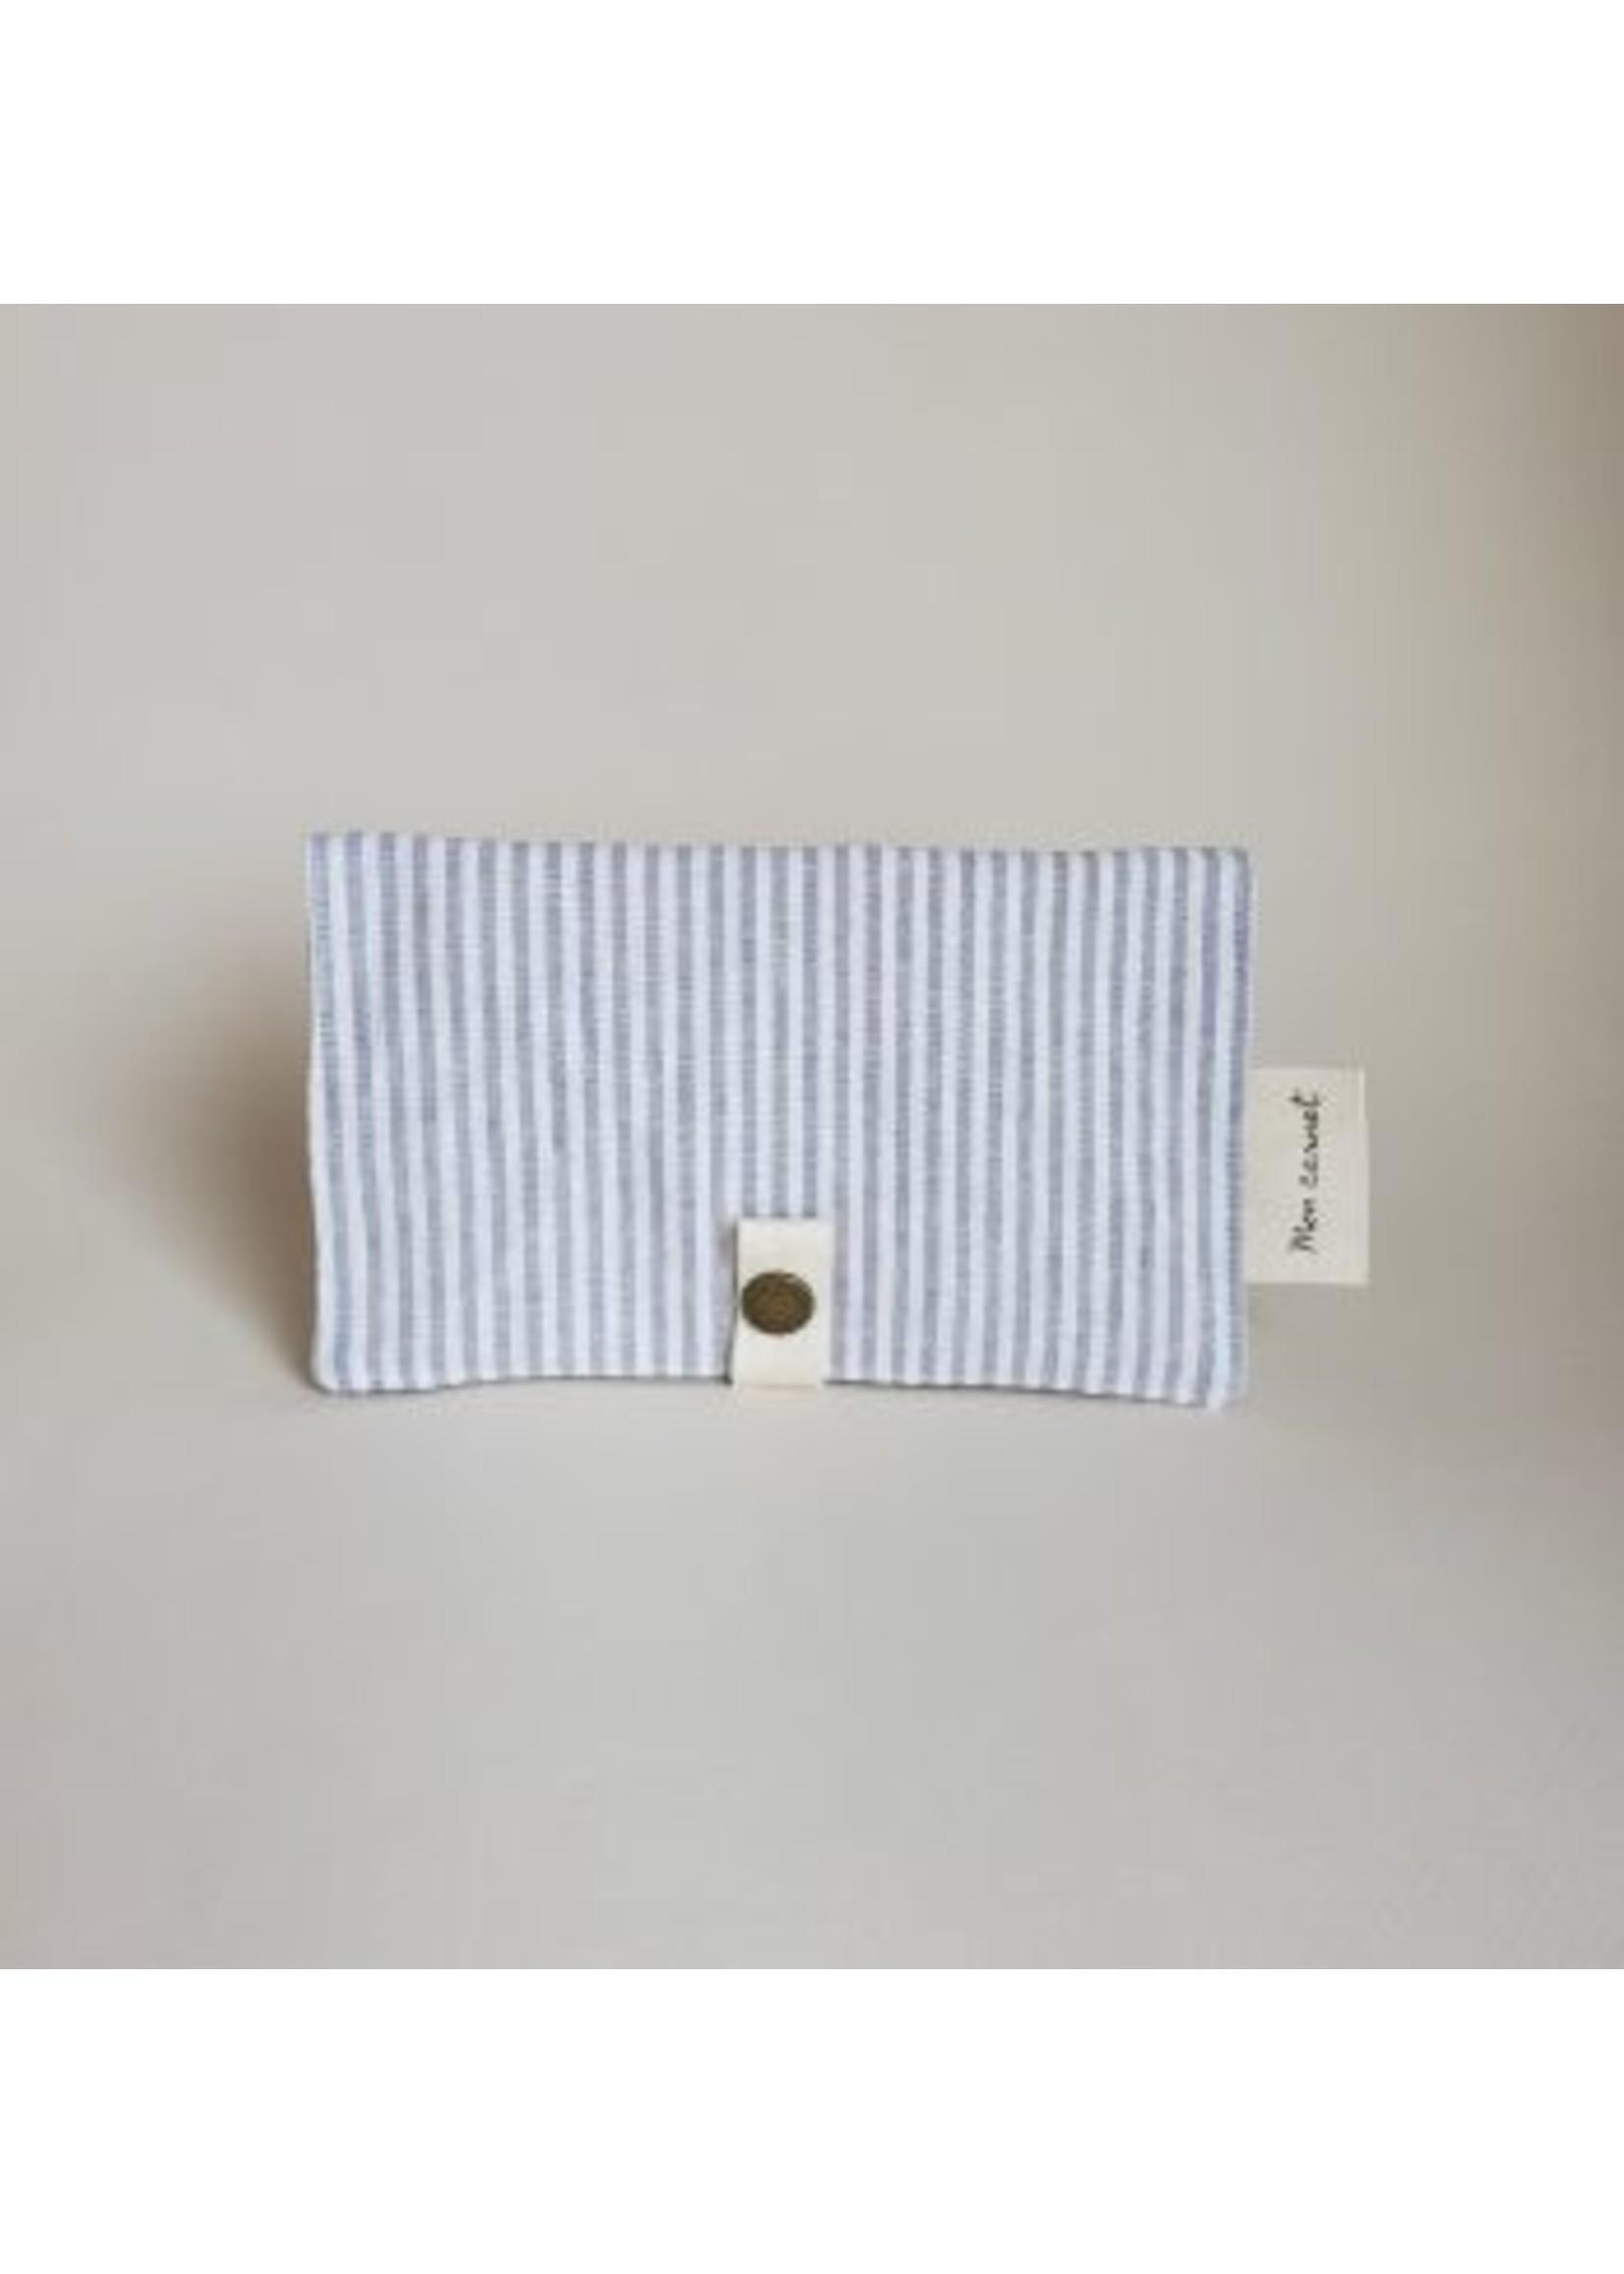 Sauge & co Protège carnet Linen stripes grey